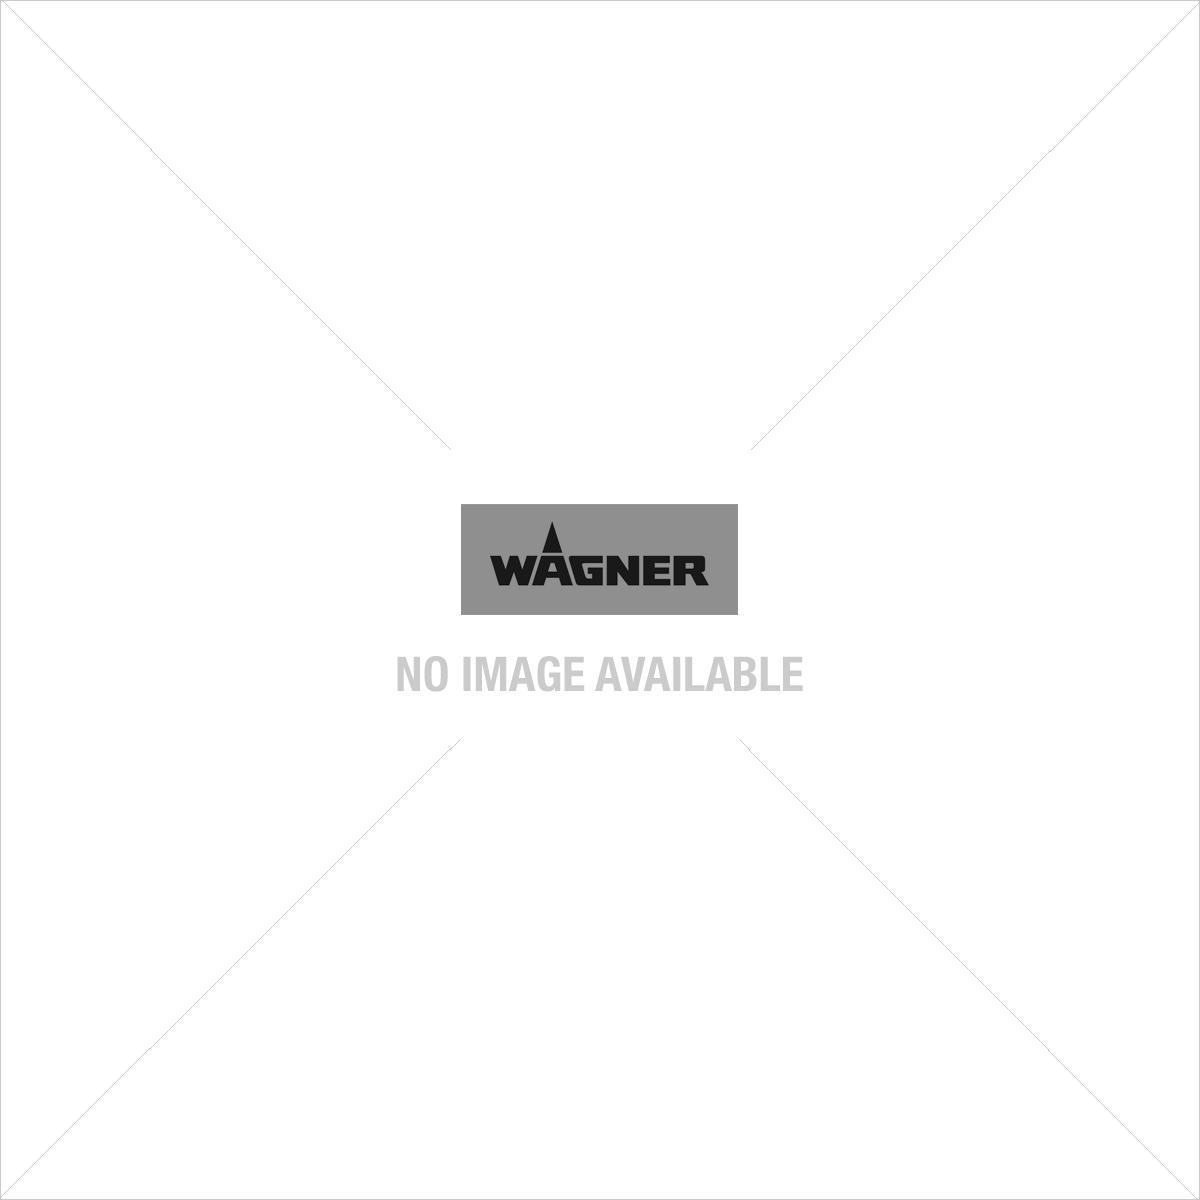 Wagner Wood & Metal Sprayer W 300 Pistolet à peinture